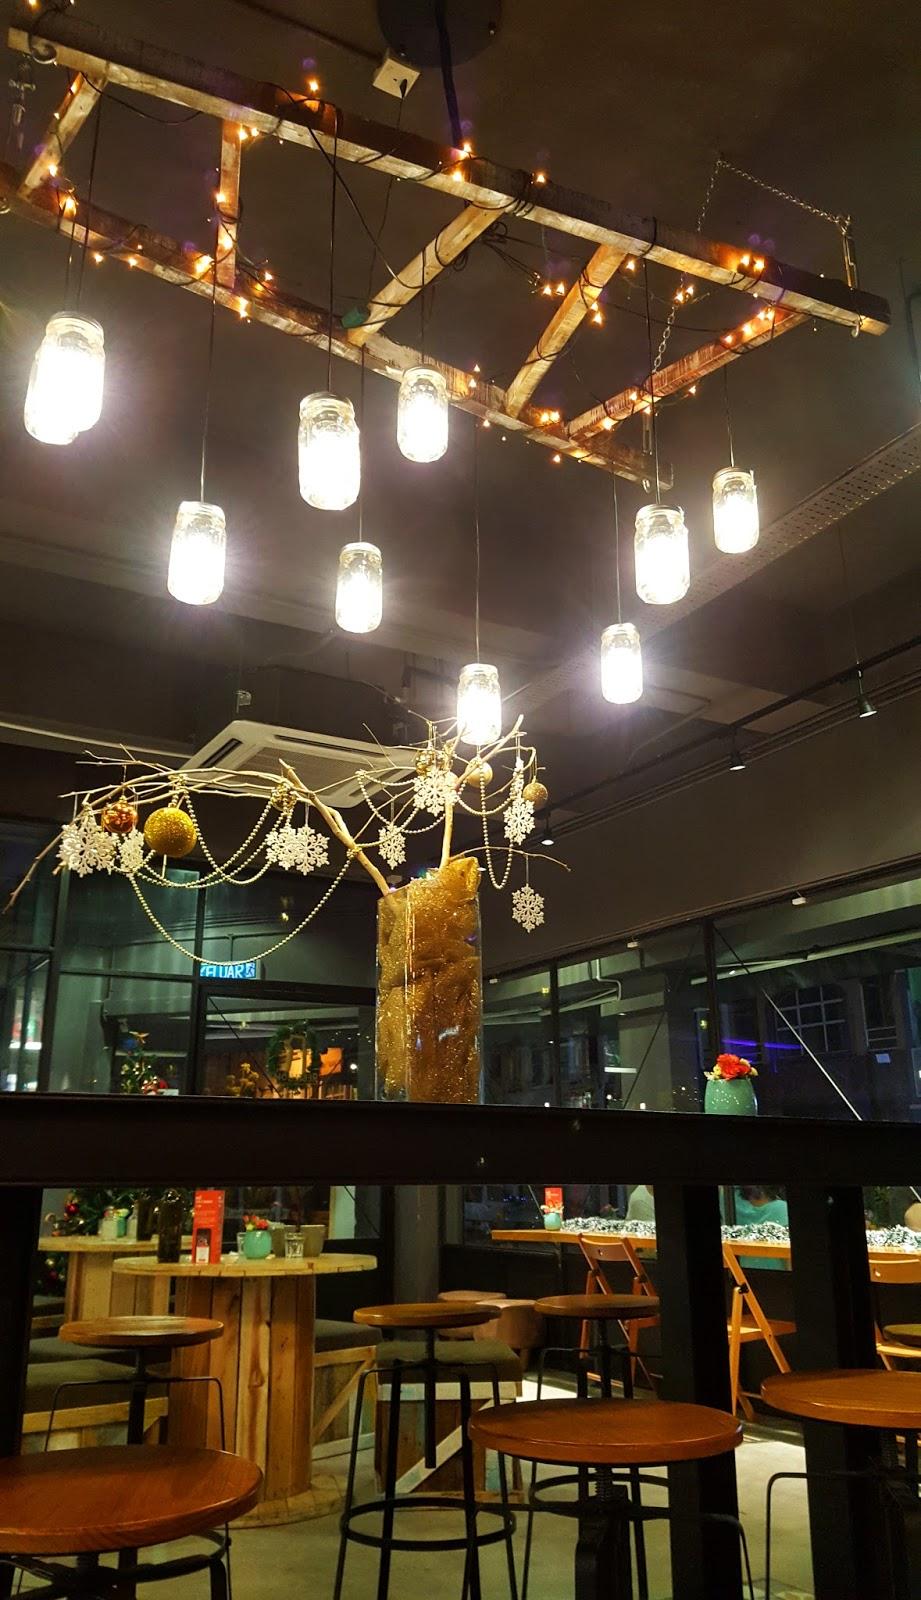 Waiii sek meowsss rebellions coffee bar kota damansara for Food bar kota damansara